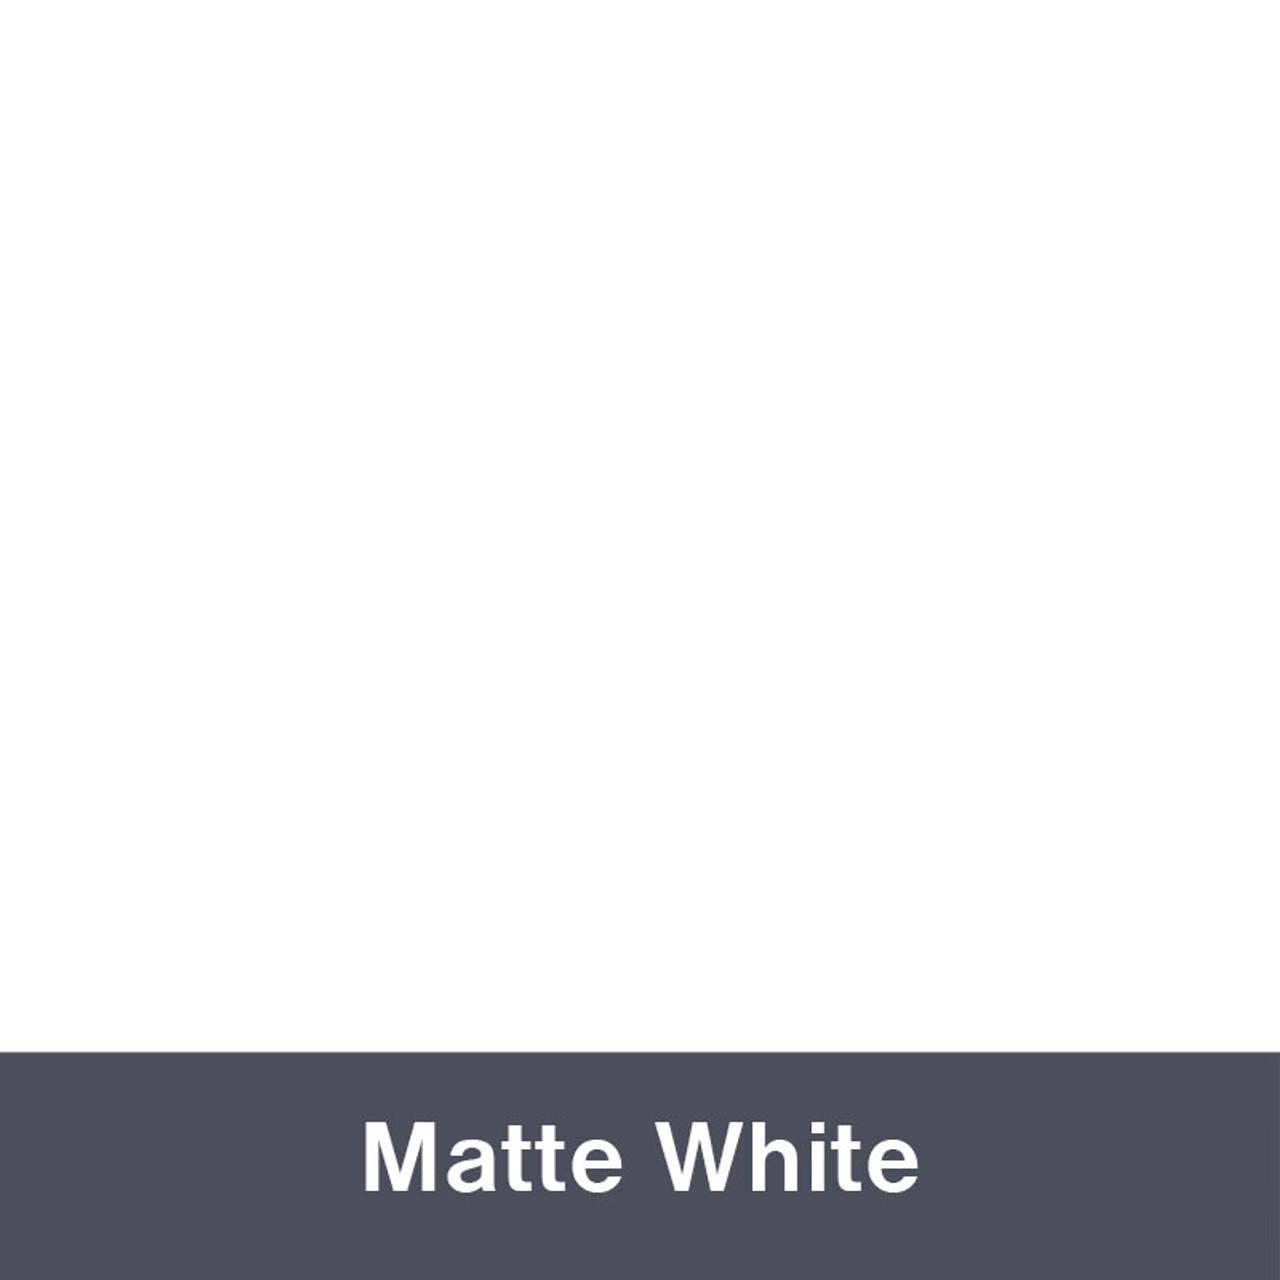 "Matte White IP3600 12"" x 24"" Permanent"